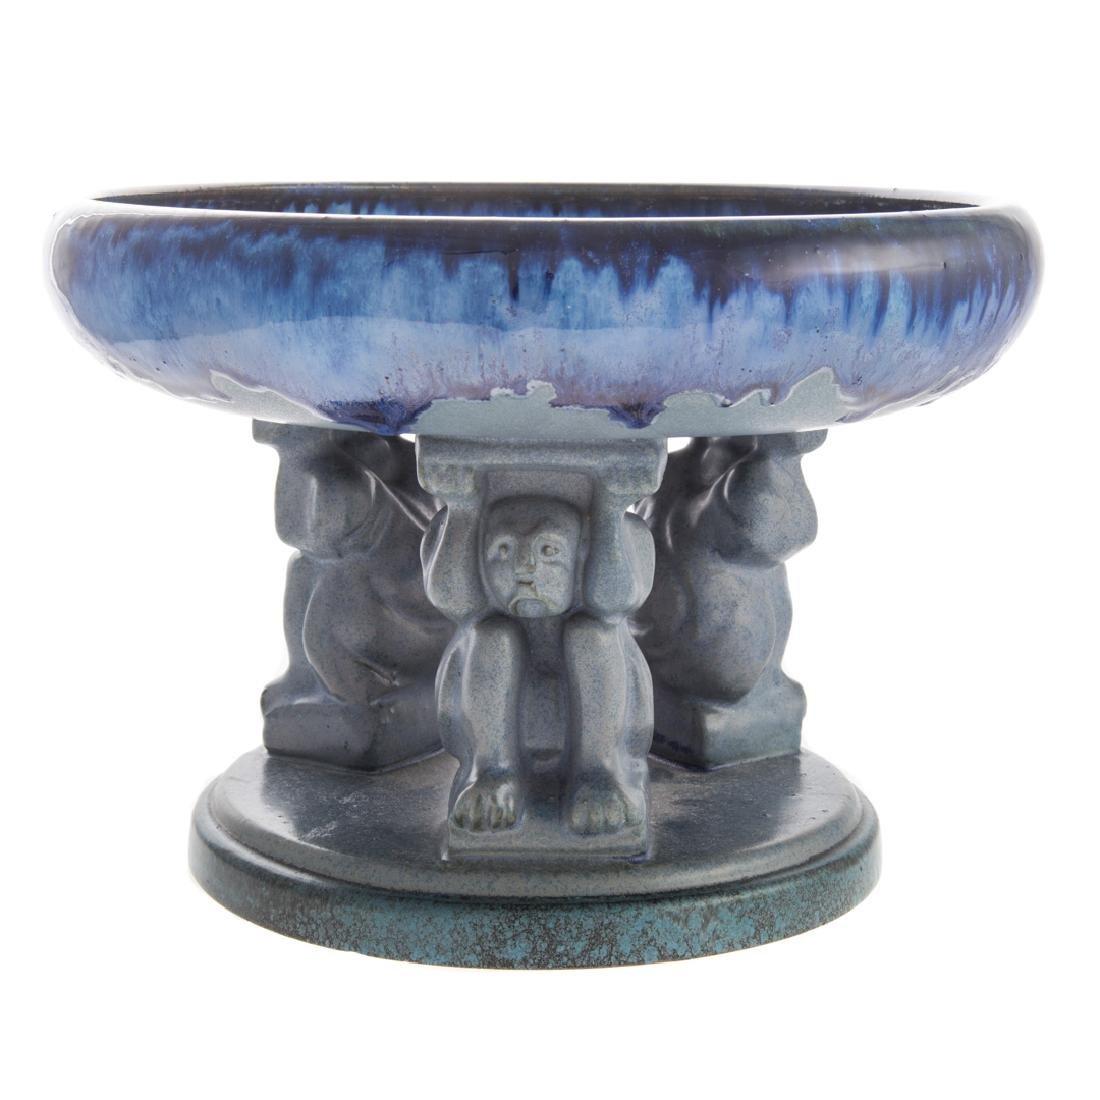 Fulper art pottery Effigy compote